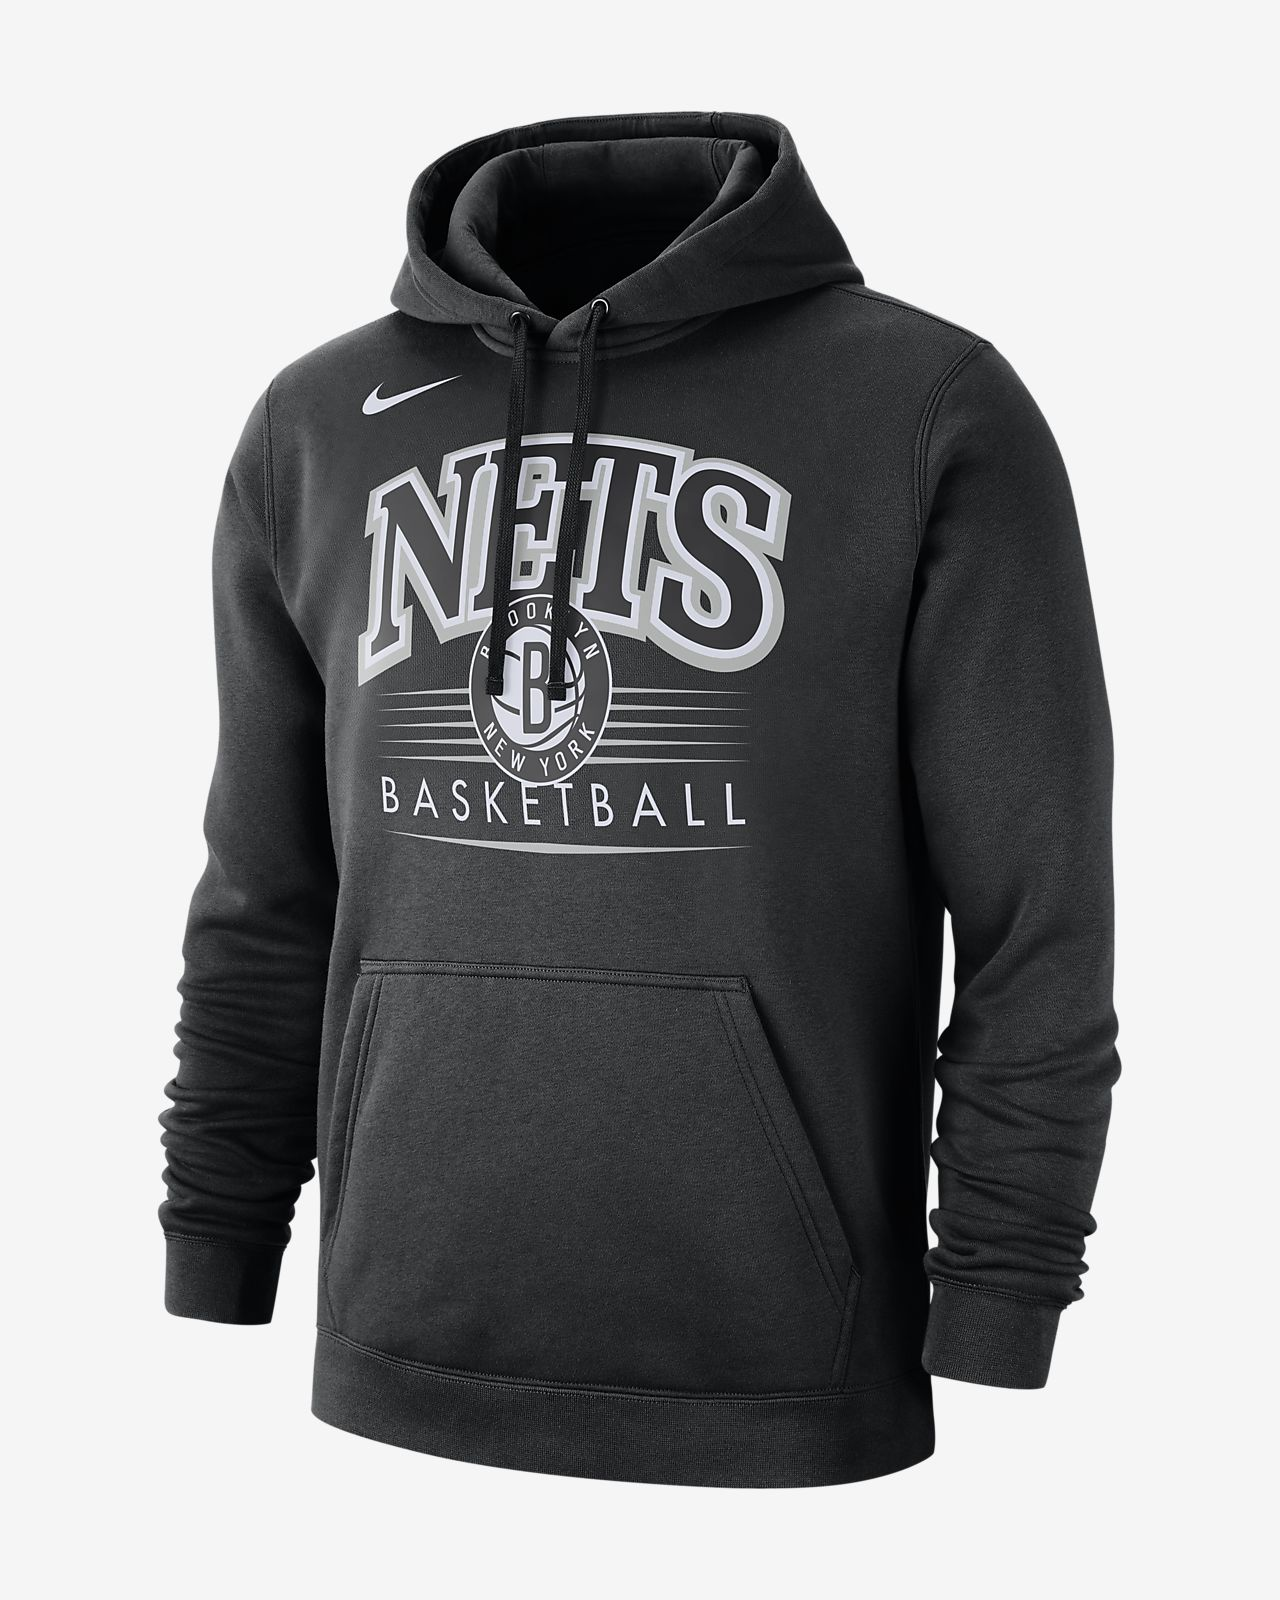 6dfac79469f93 Sweat à capuche NBA Brooklyn Nets Nike pour Homme